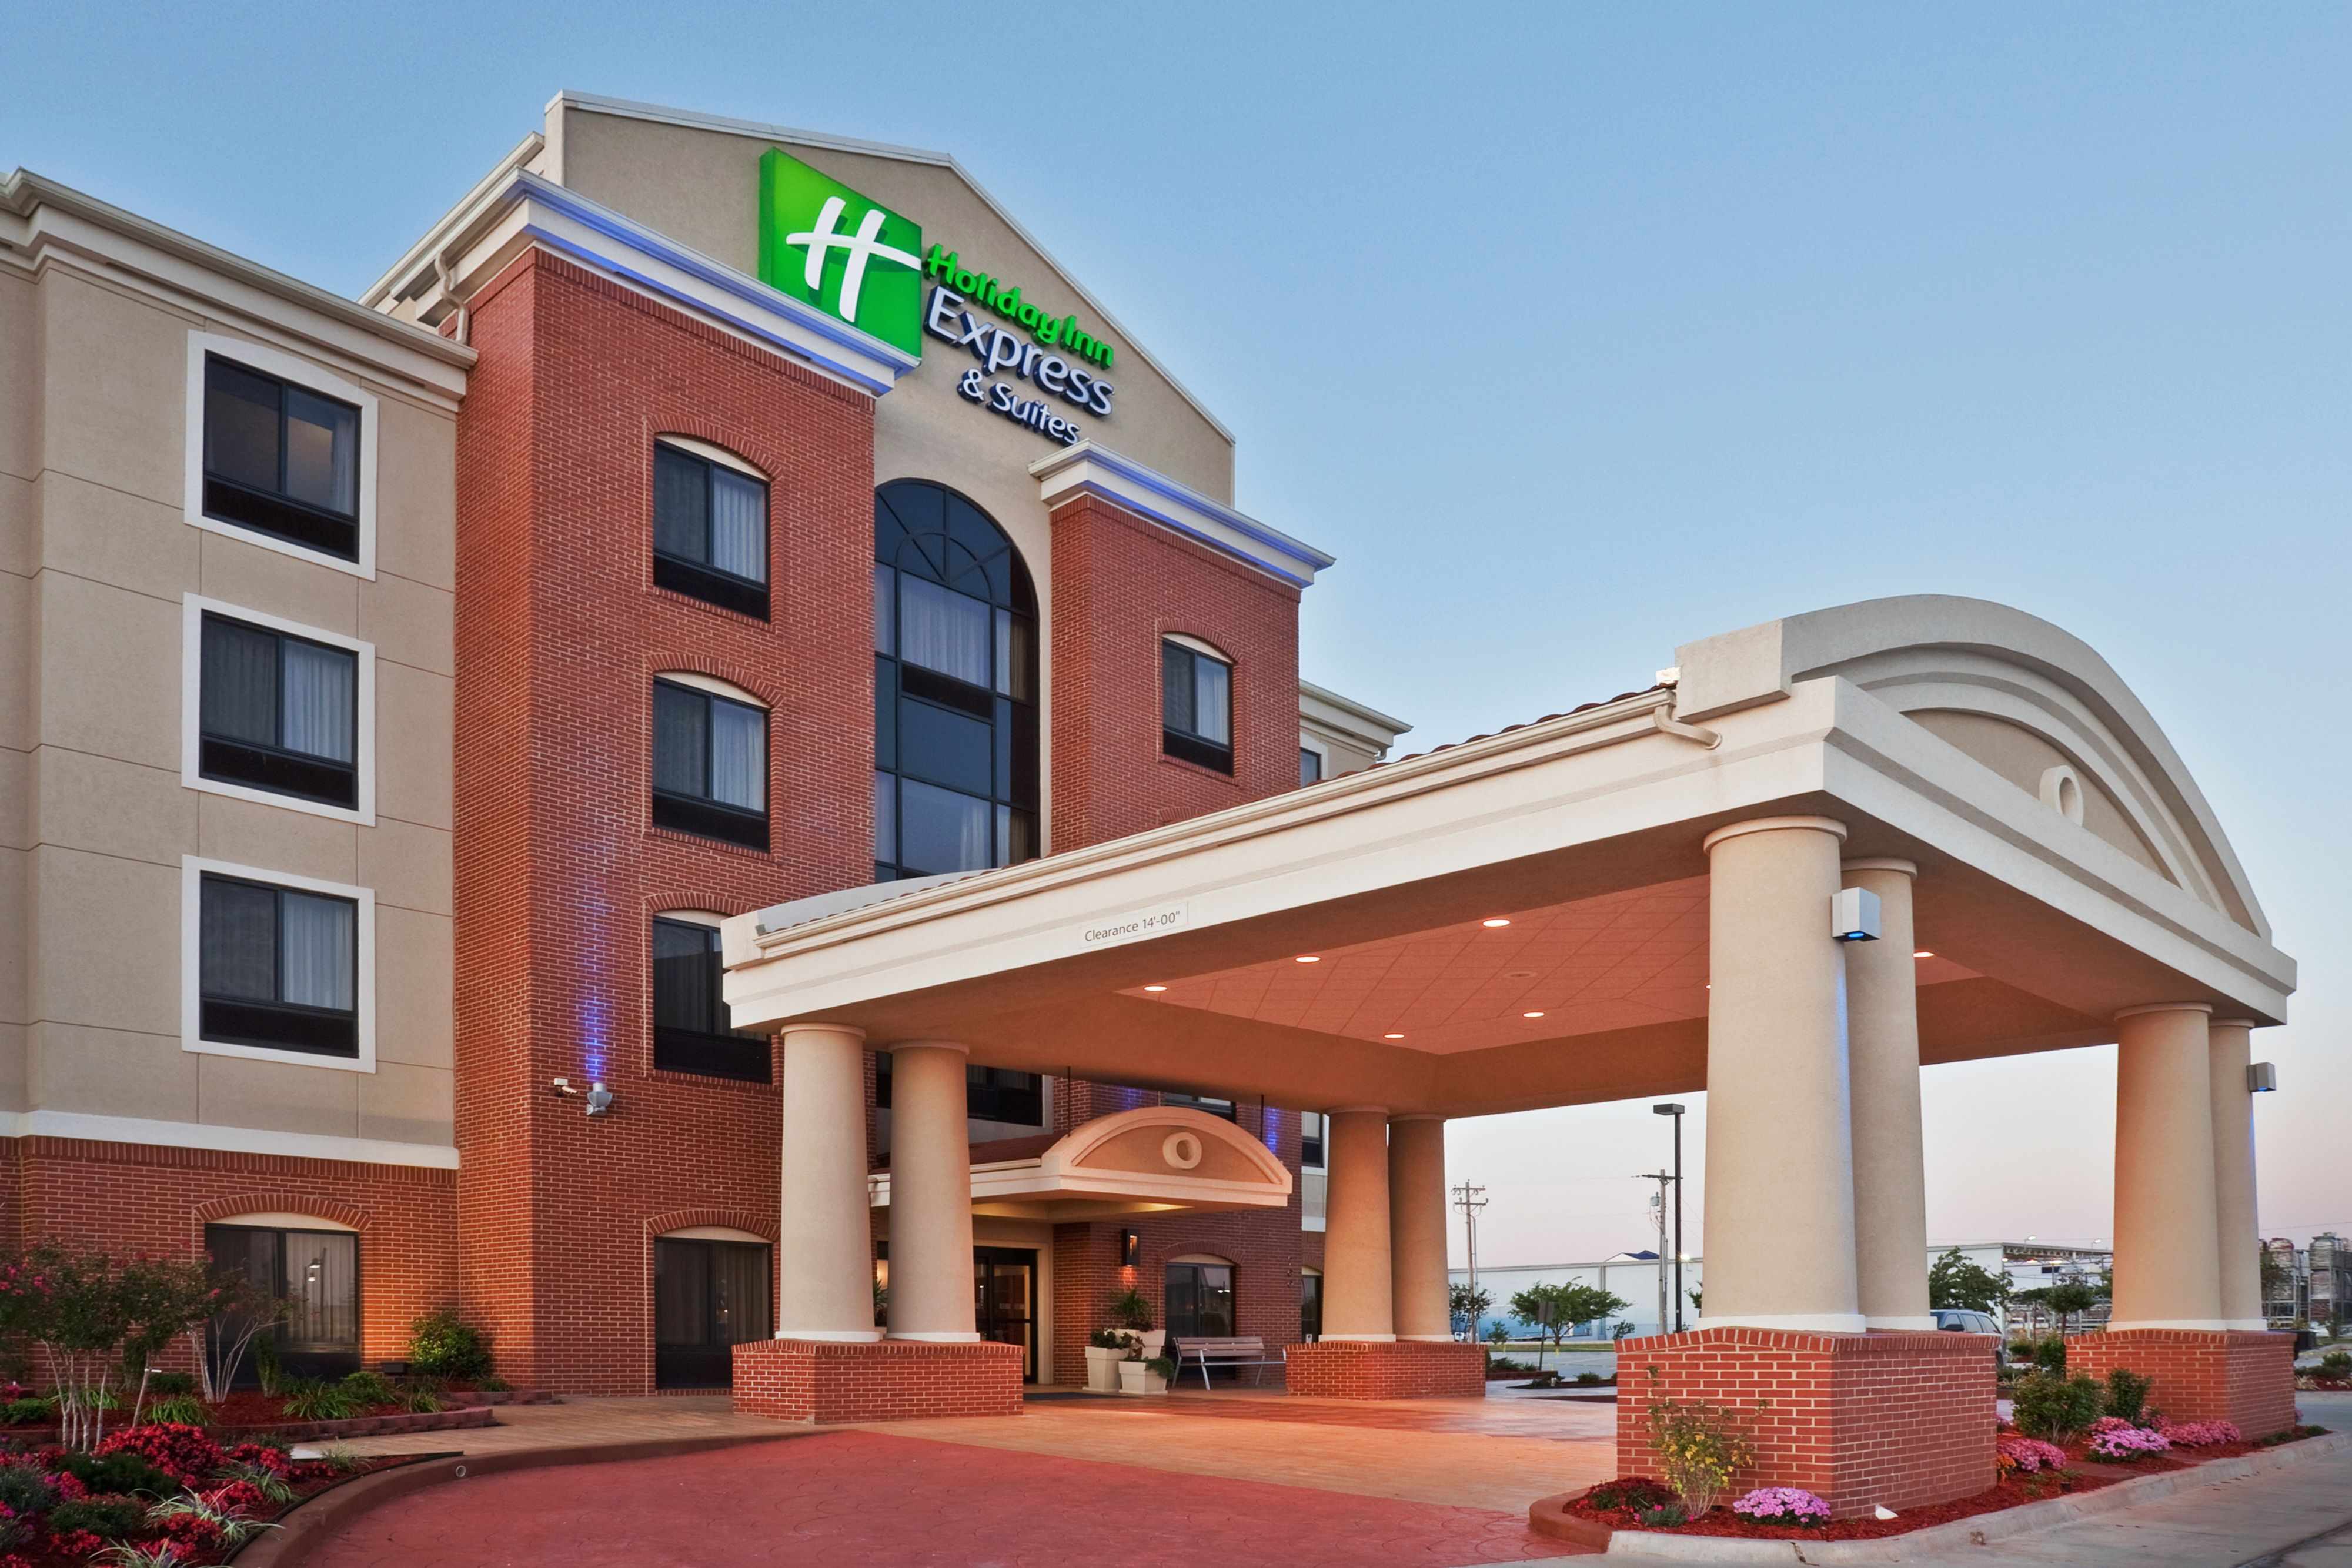 Holiday Inn Express & Suites Oklahoma City Nw-Quail Springs image 5